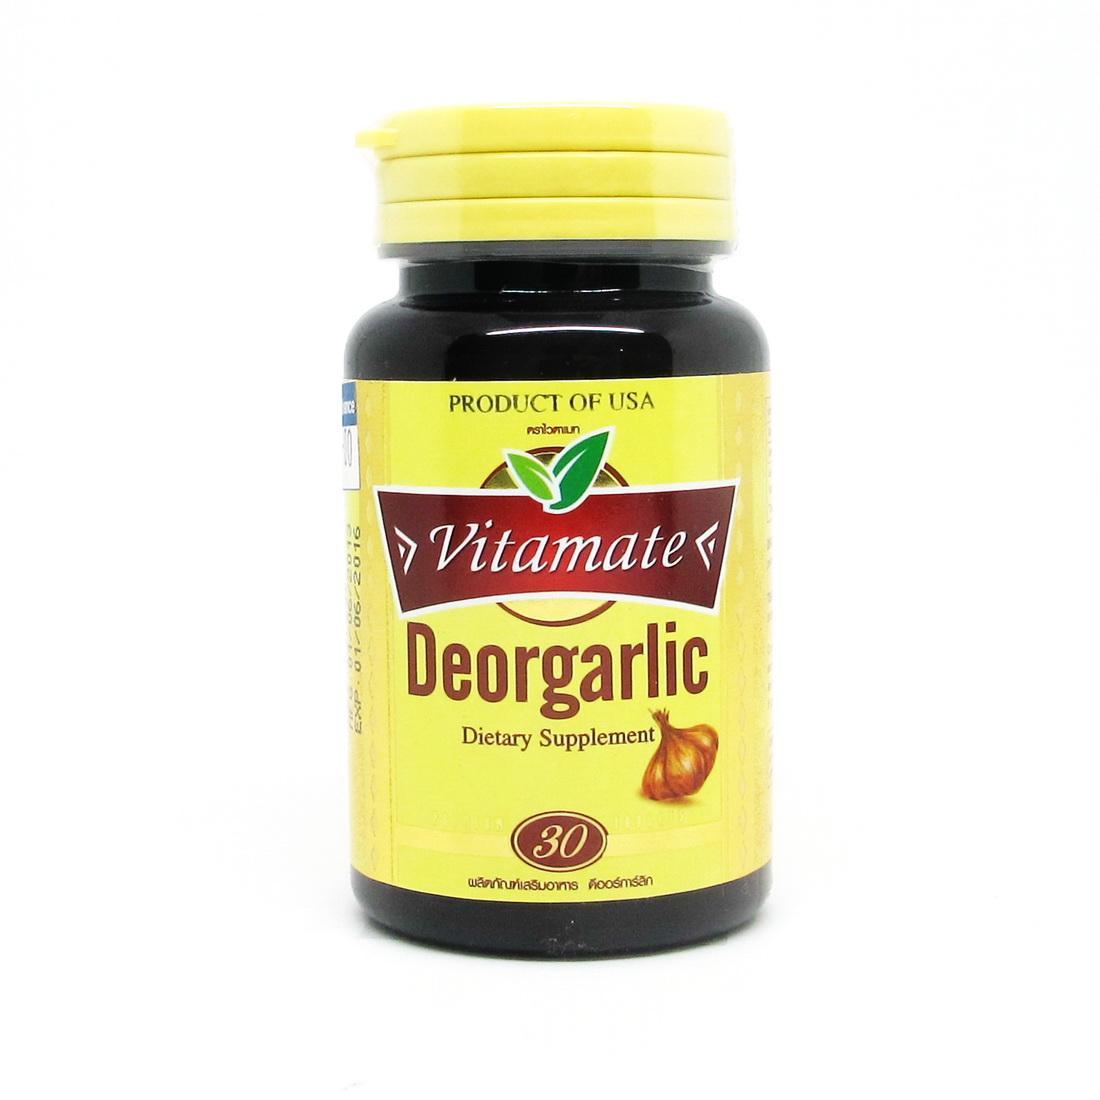 Vitamate Deogarlic 30เม็ด